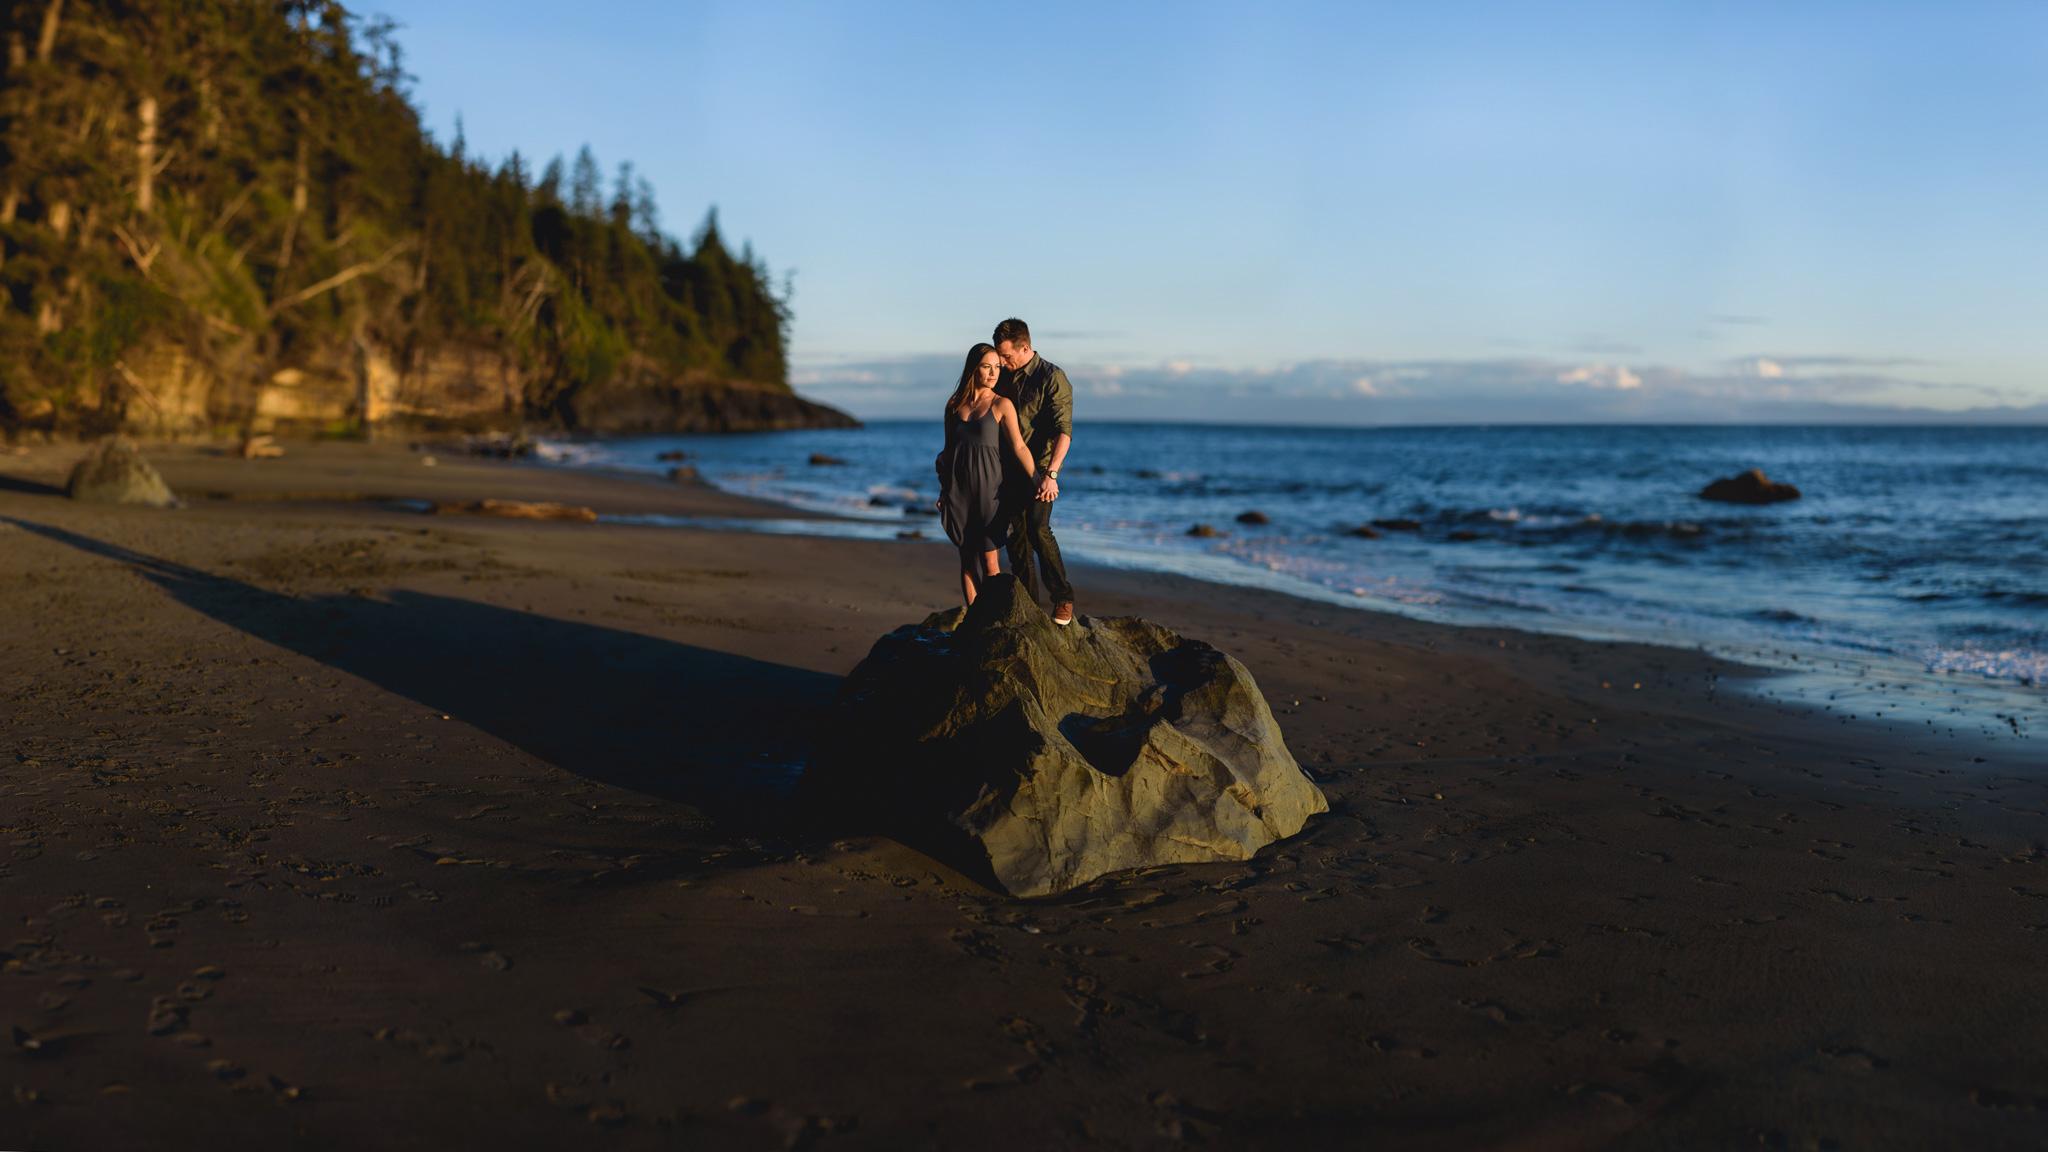 mystic-beach-engagement-victoria-wedding-photographer-26.jpg